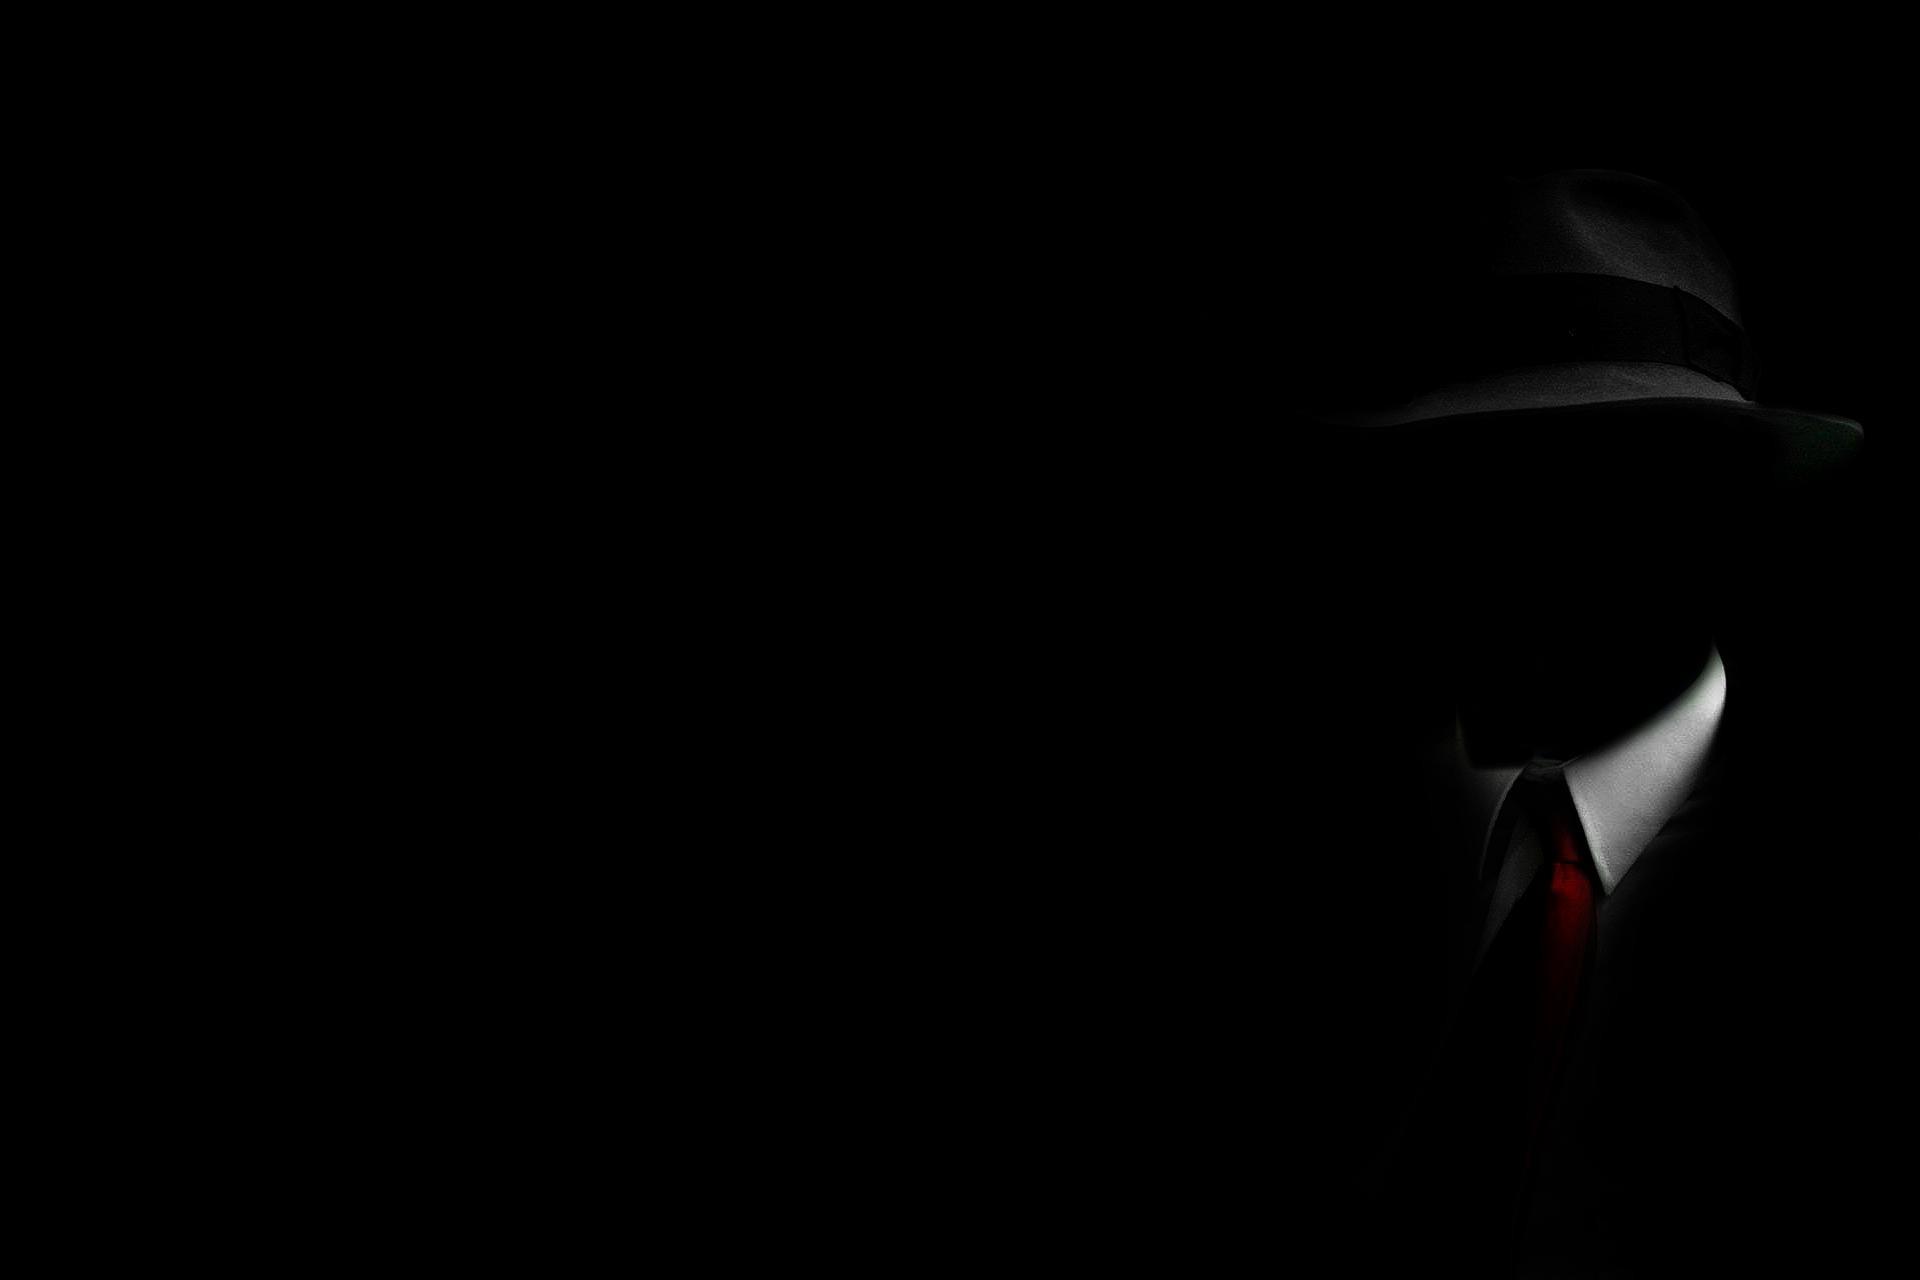 Black Wallpapers Free Download: Black Wallpaper ·① Download Free Amazing Full HD